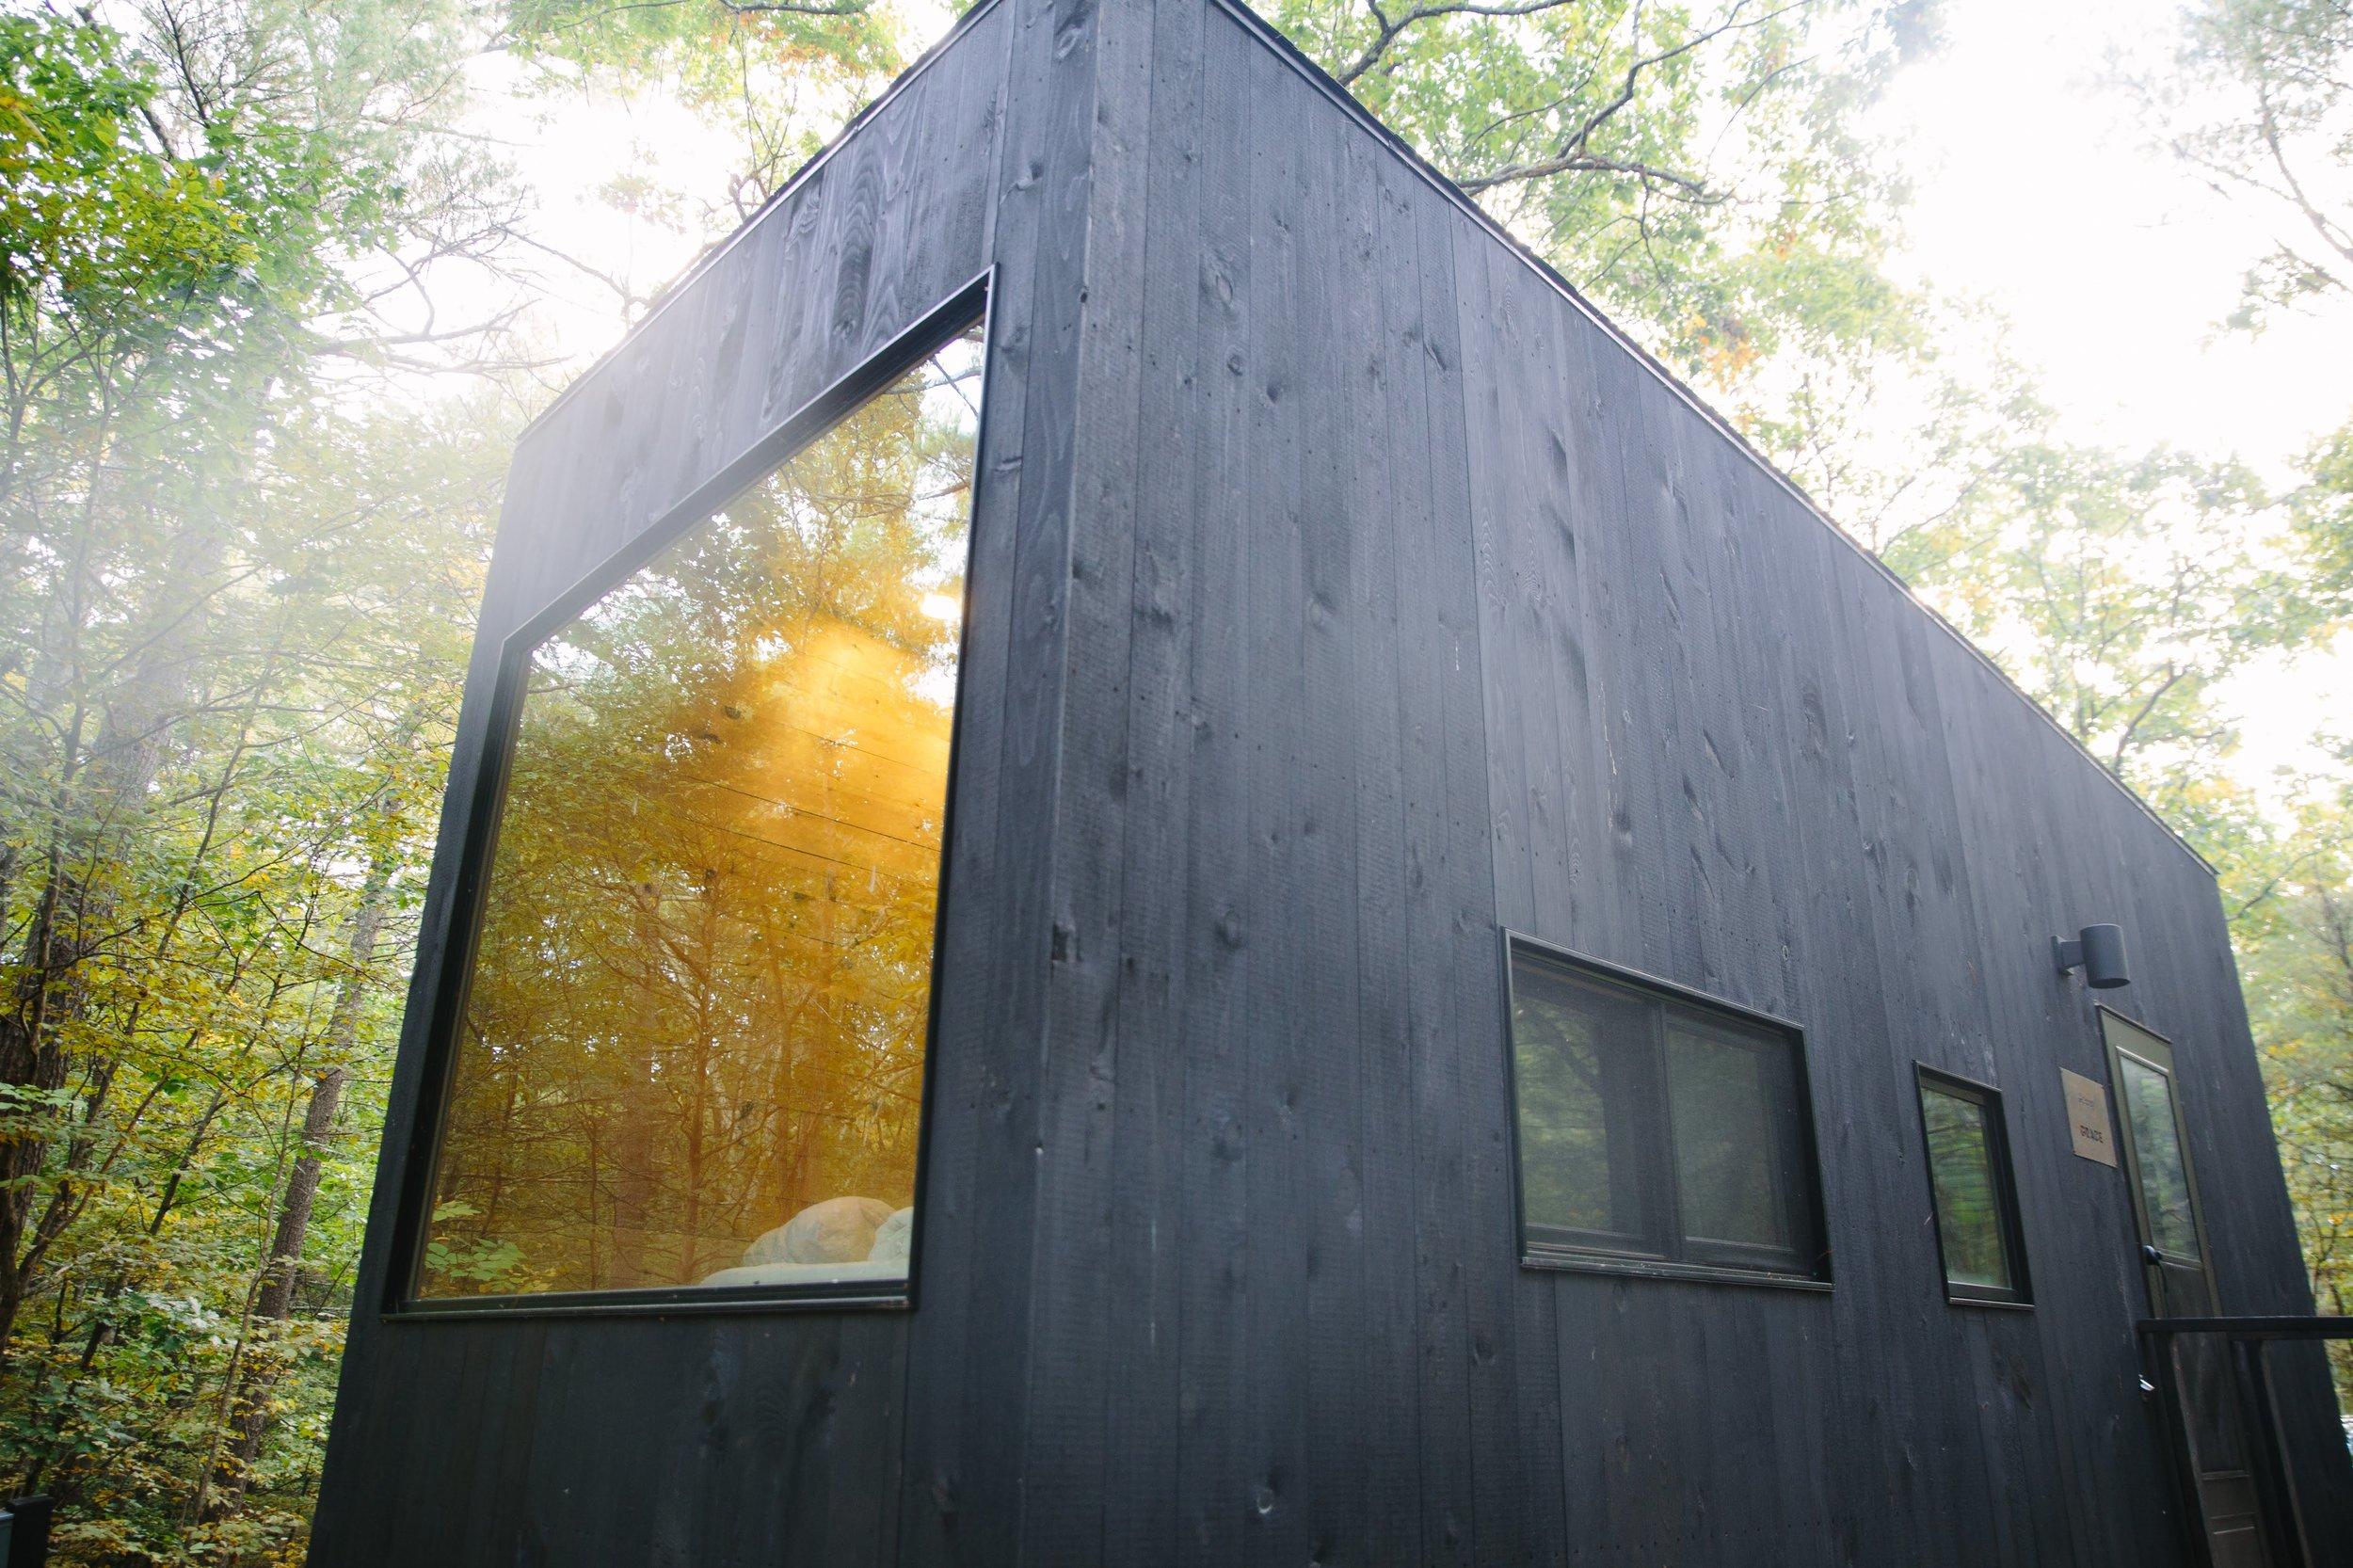 Getaway tiny house reviews on The Dapple lifestyle blog